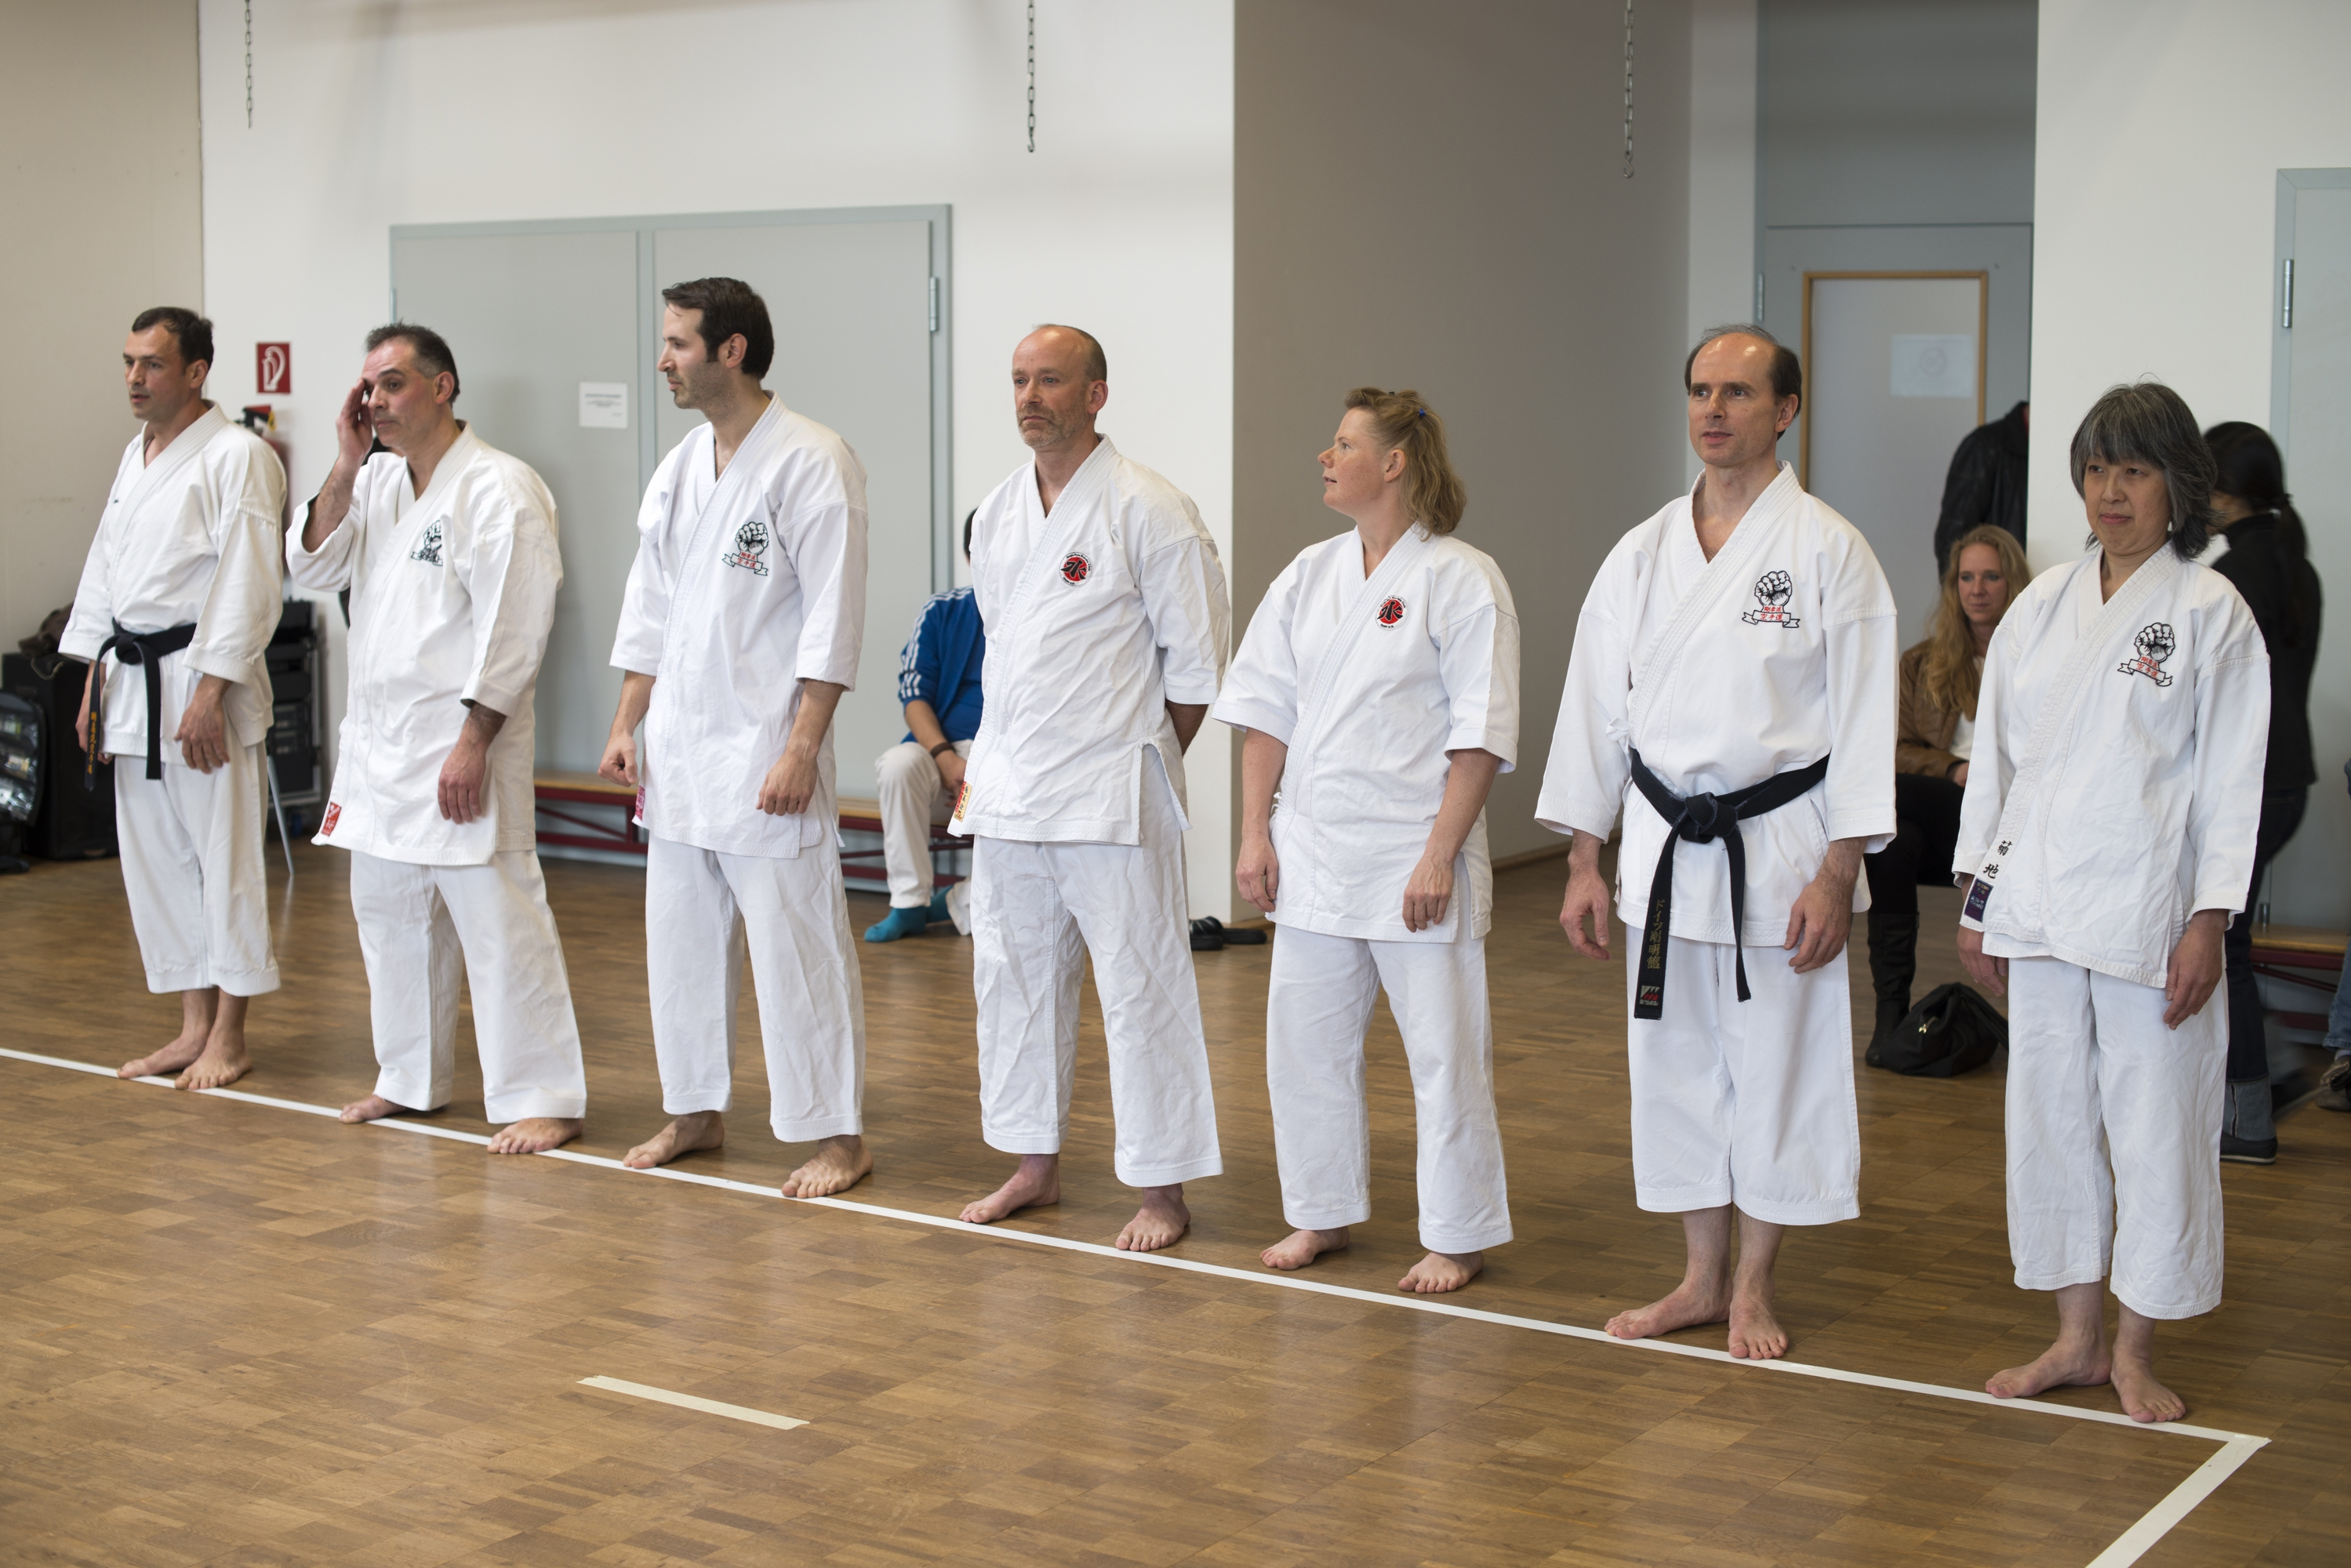 2016-04-26 Kata Turnier Kaarst 260